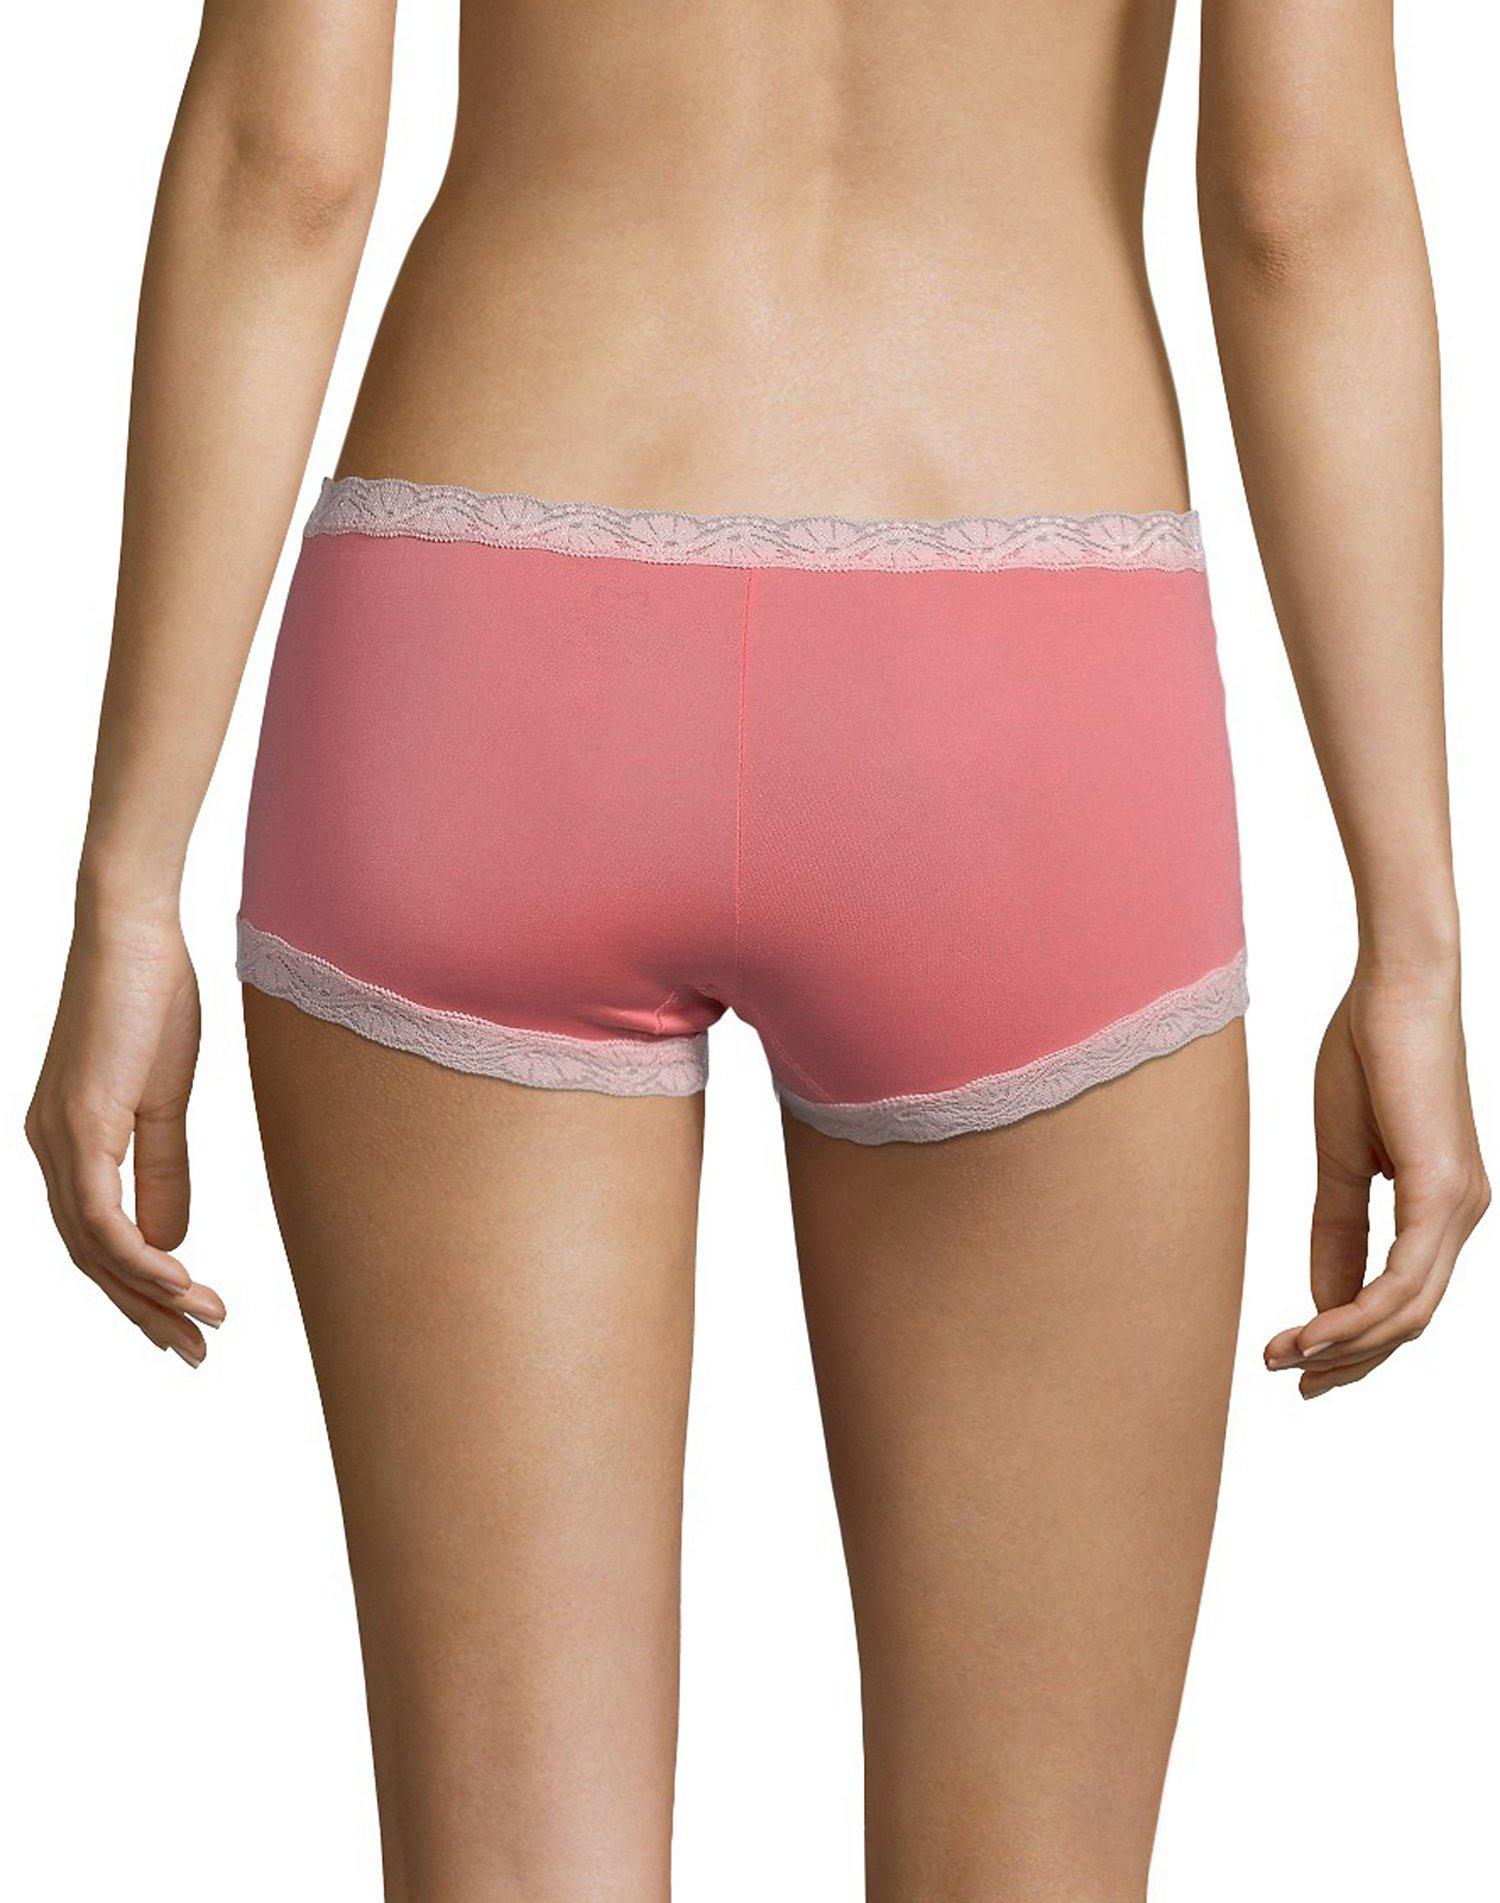 d2253511acc6 Maidenform Microfiber Boyshort Panties | Maidenform